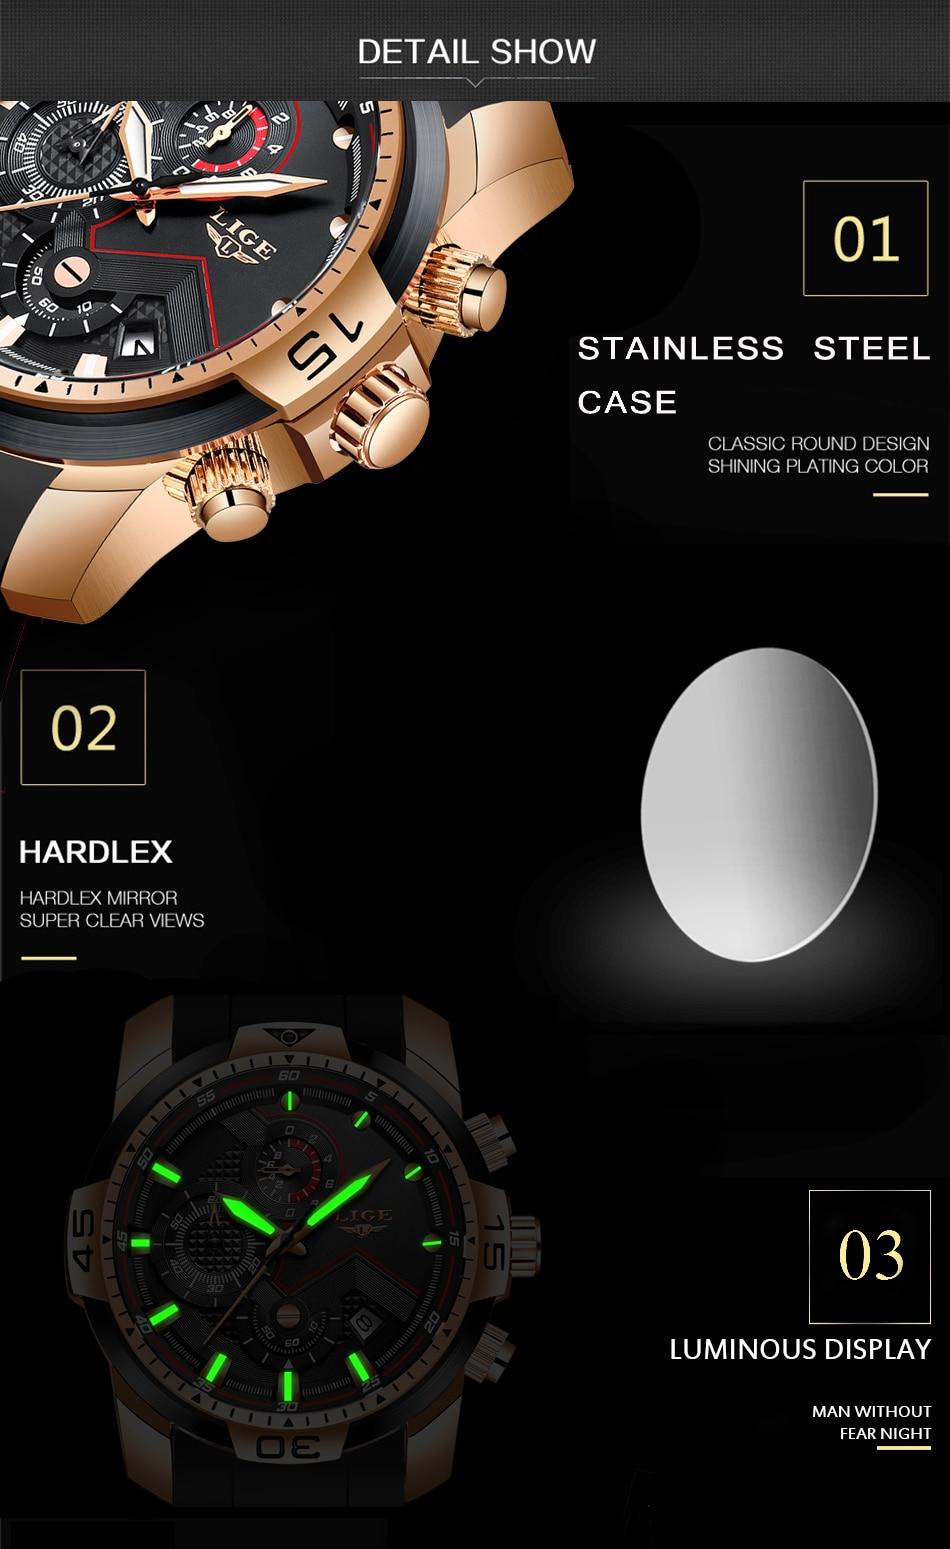 H9f51bfdd00b2495c9aeb73f0355834e7I 2020 LIGE New Mens Watches Top Luxury Brand Men Unique Sport Watch Men Quartz Date Clock Waterproof Wristwatch Relogio Masculino